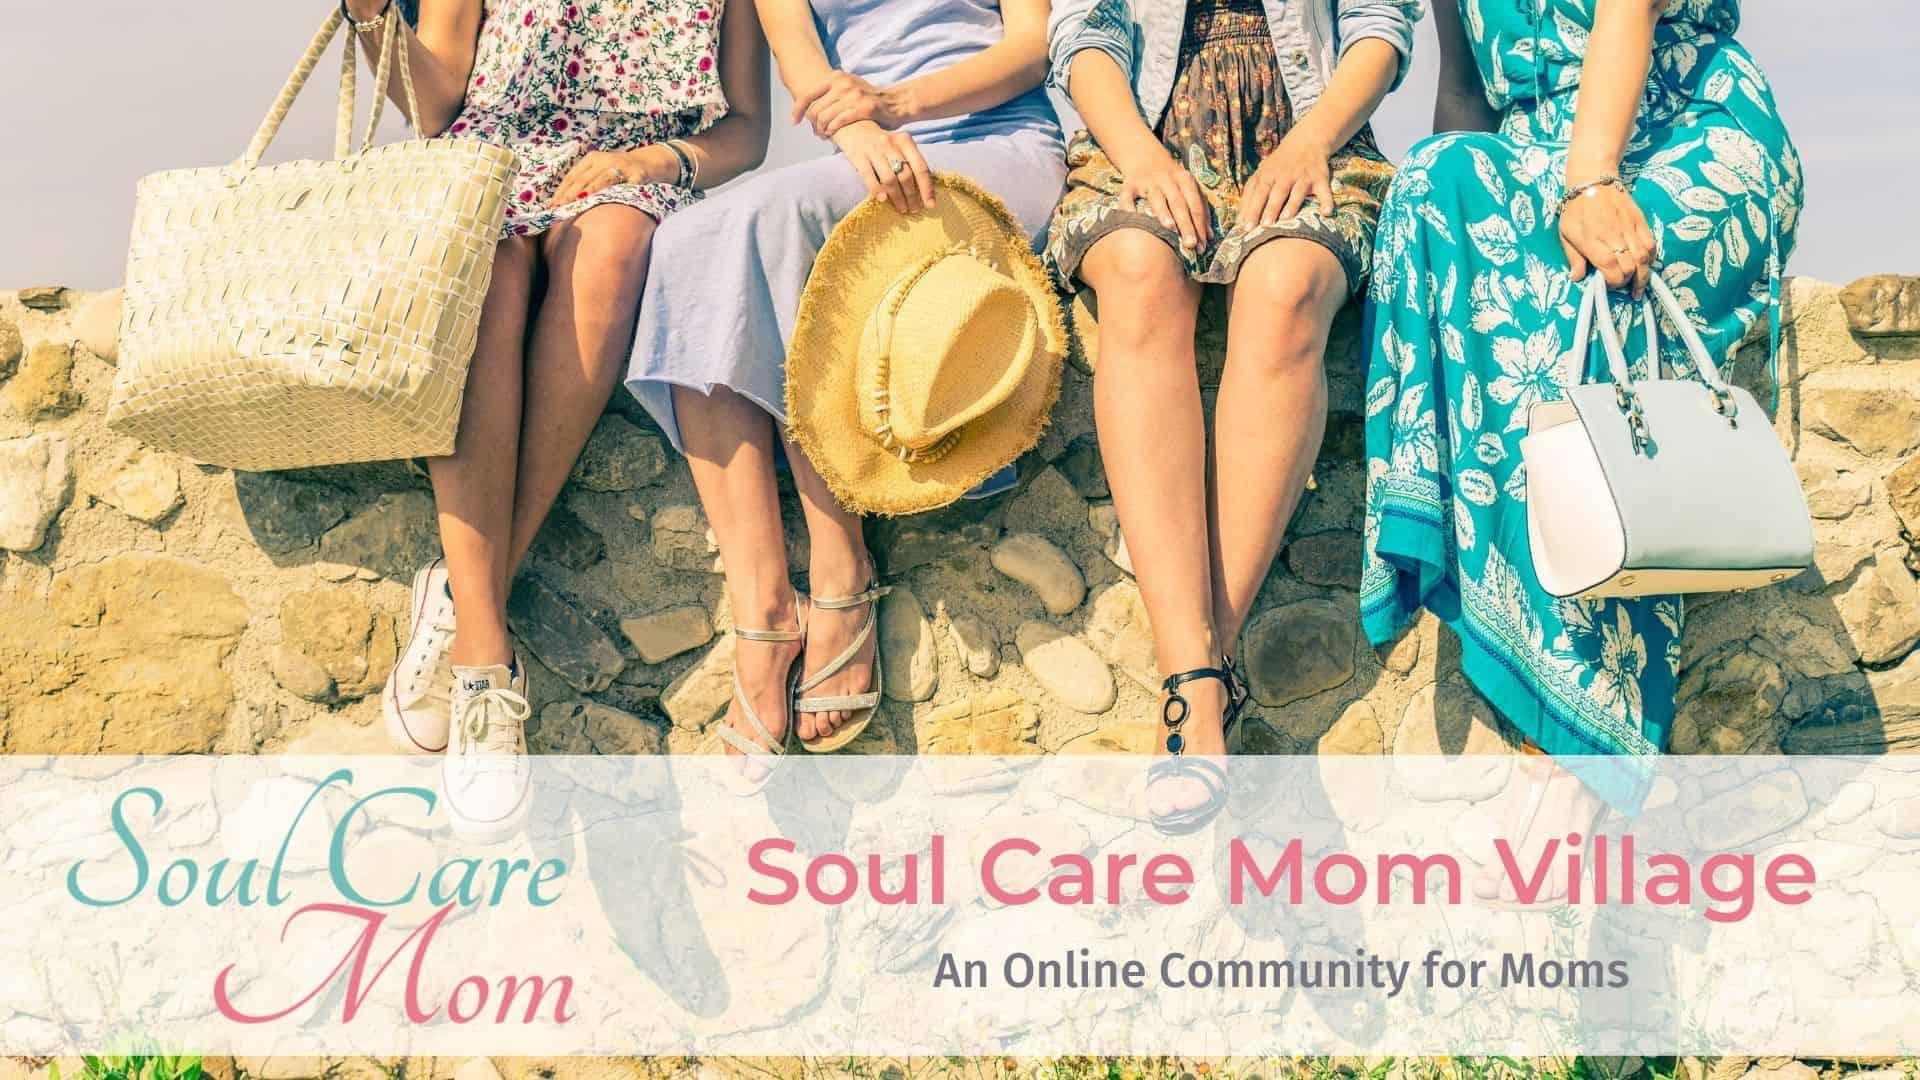 Soul Care Mom Village - Soul Care Mom 1920x1080